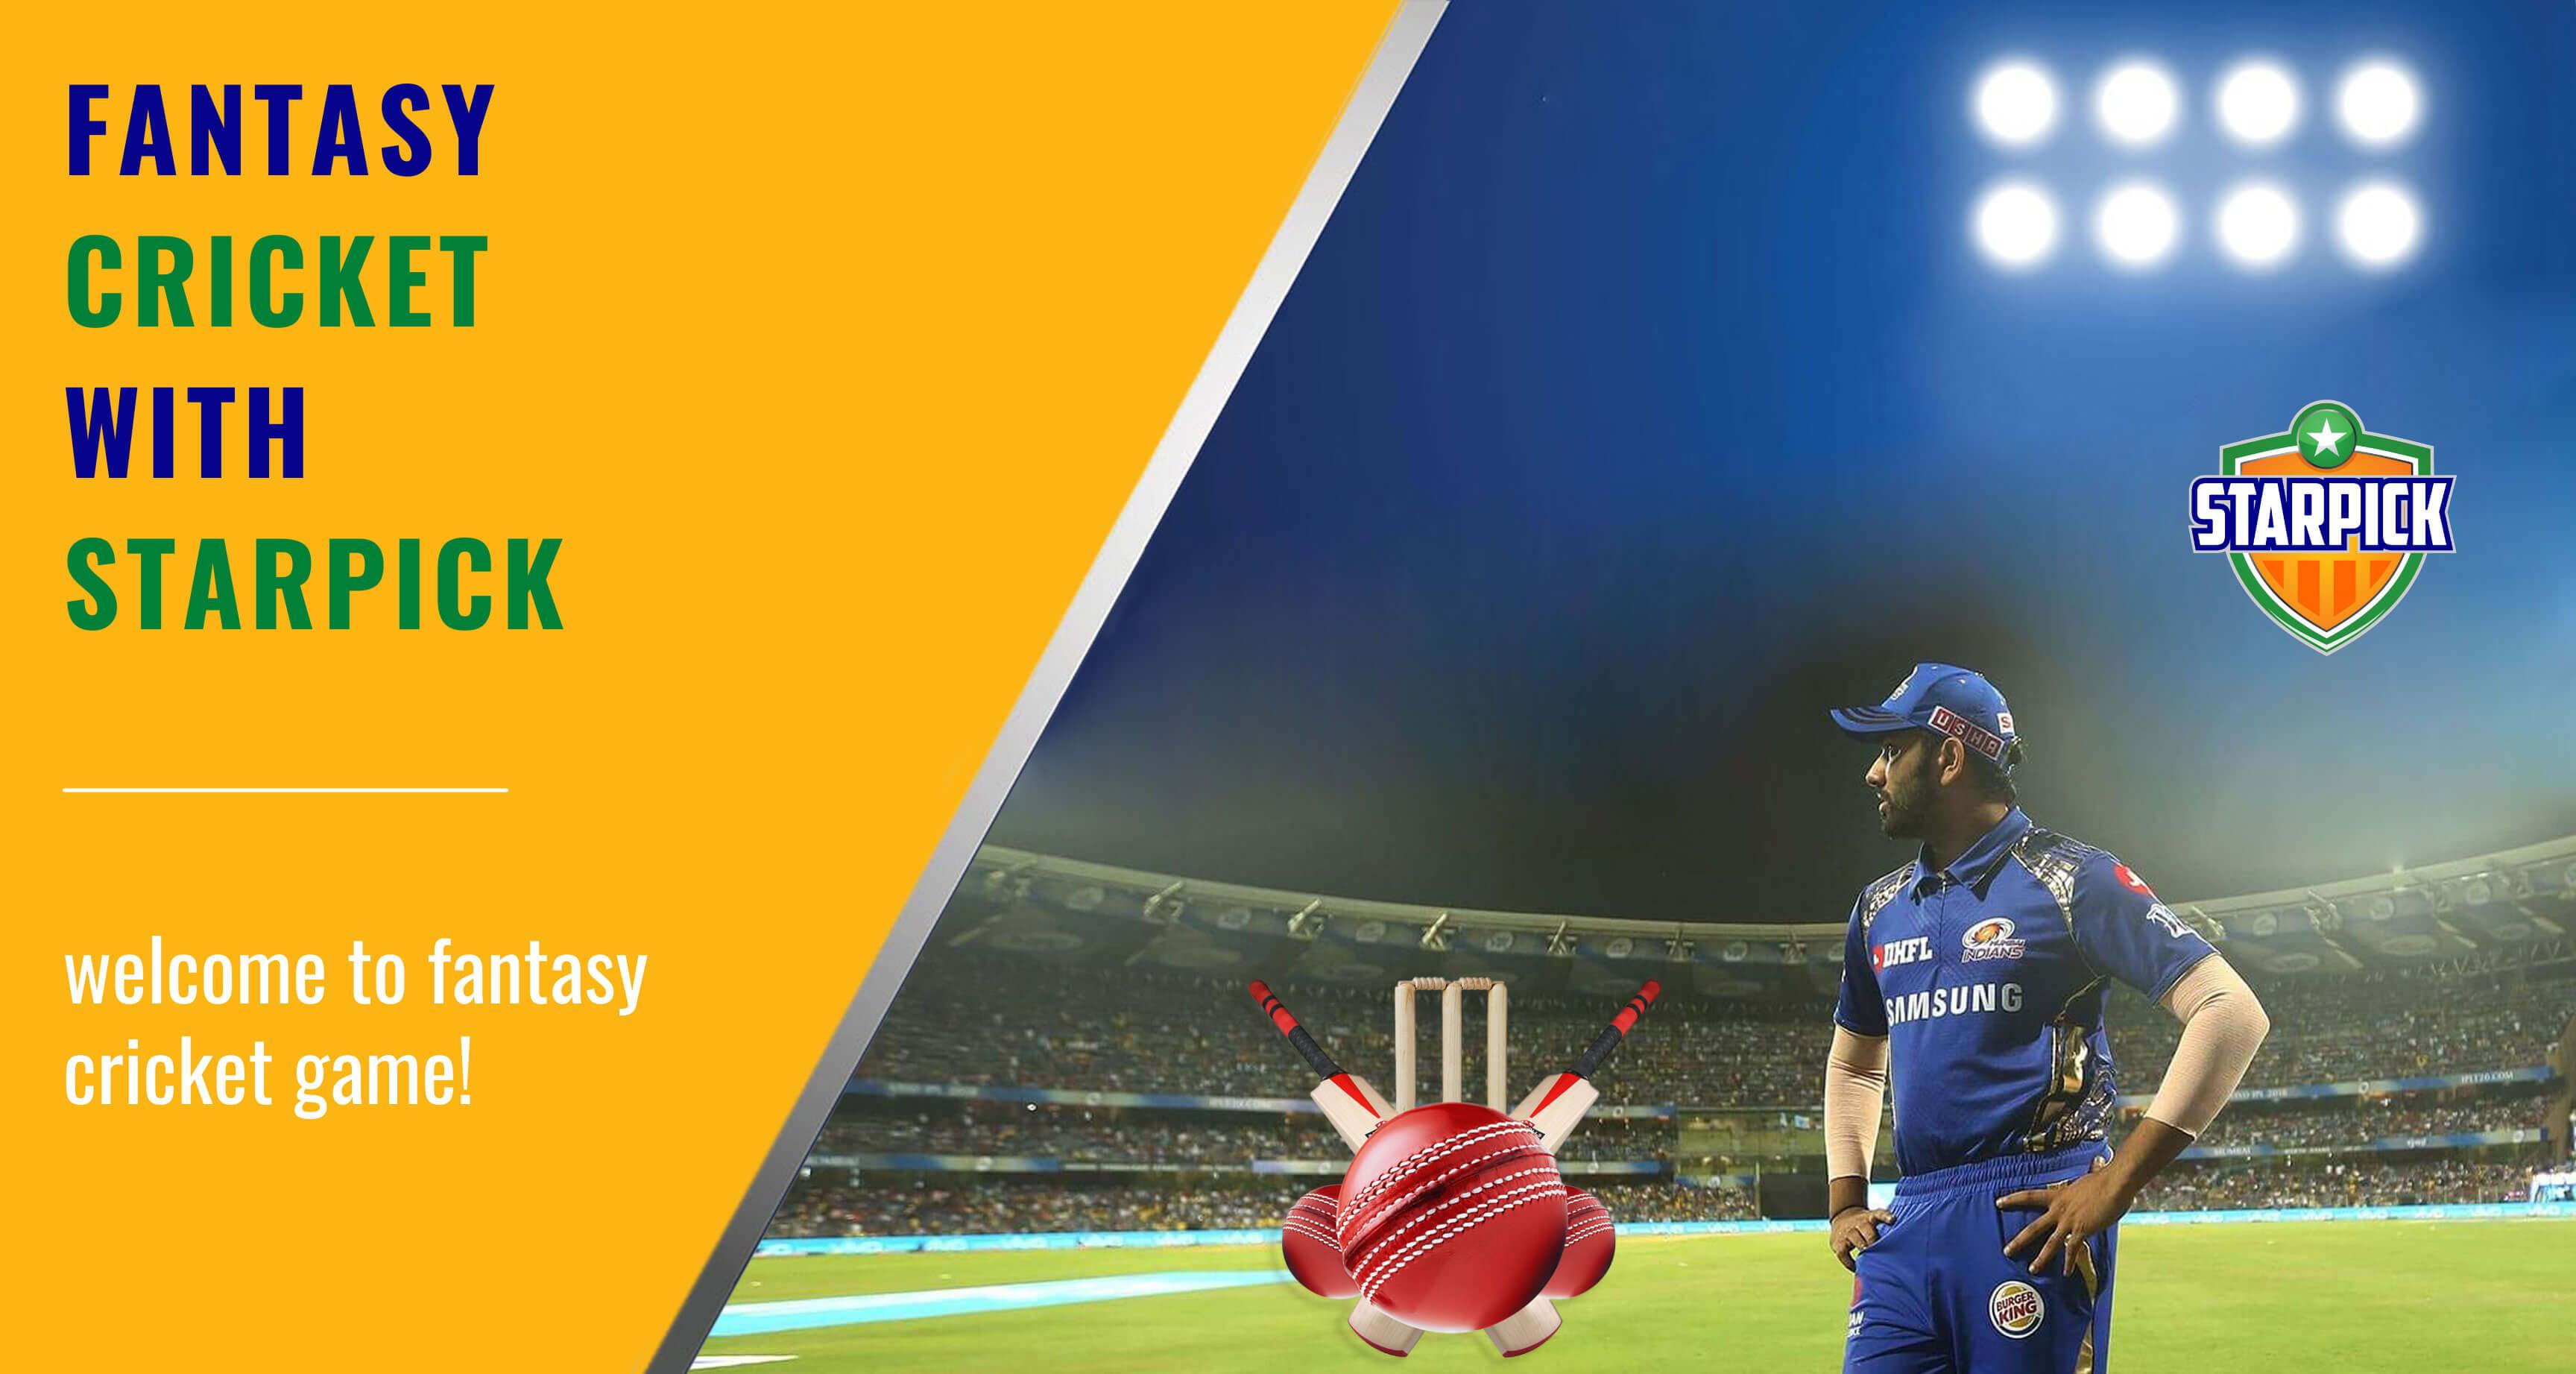 Fantasy Cricket with Starpick